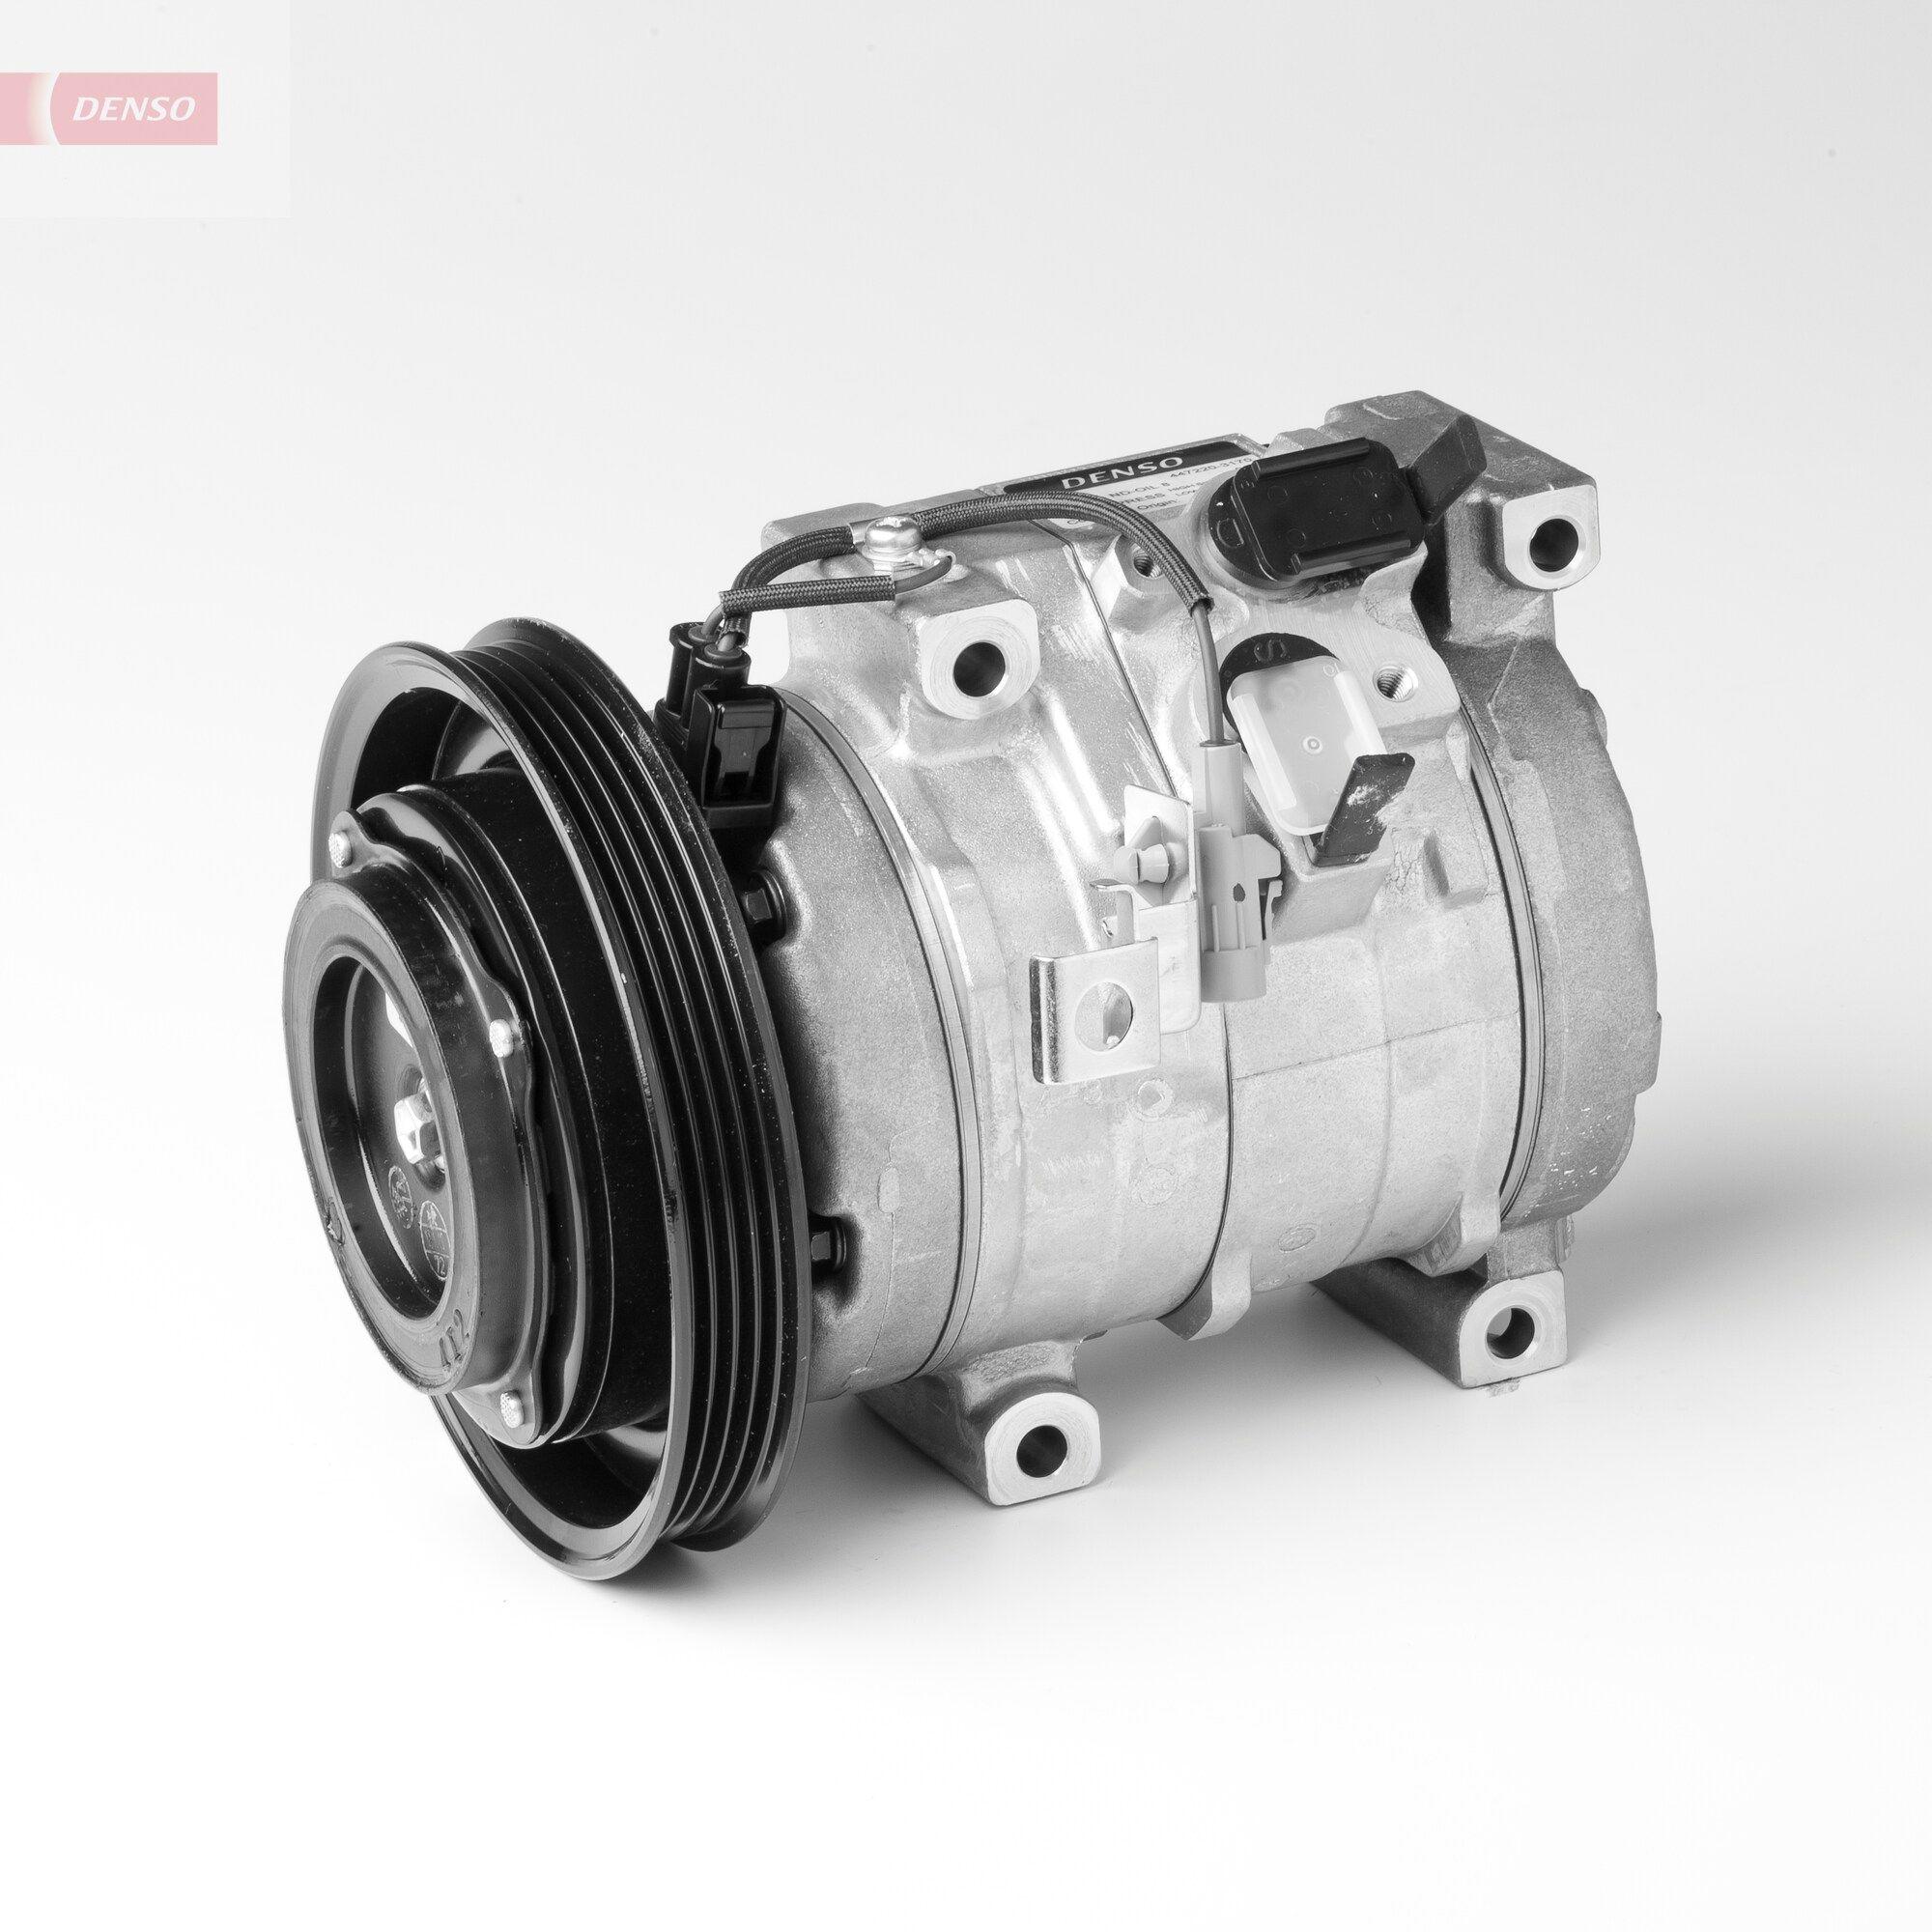 Klimakompressor DENSO DCP51000